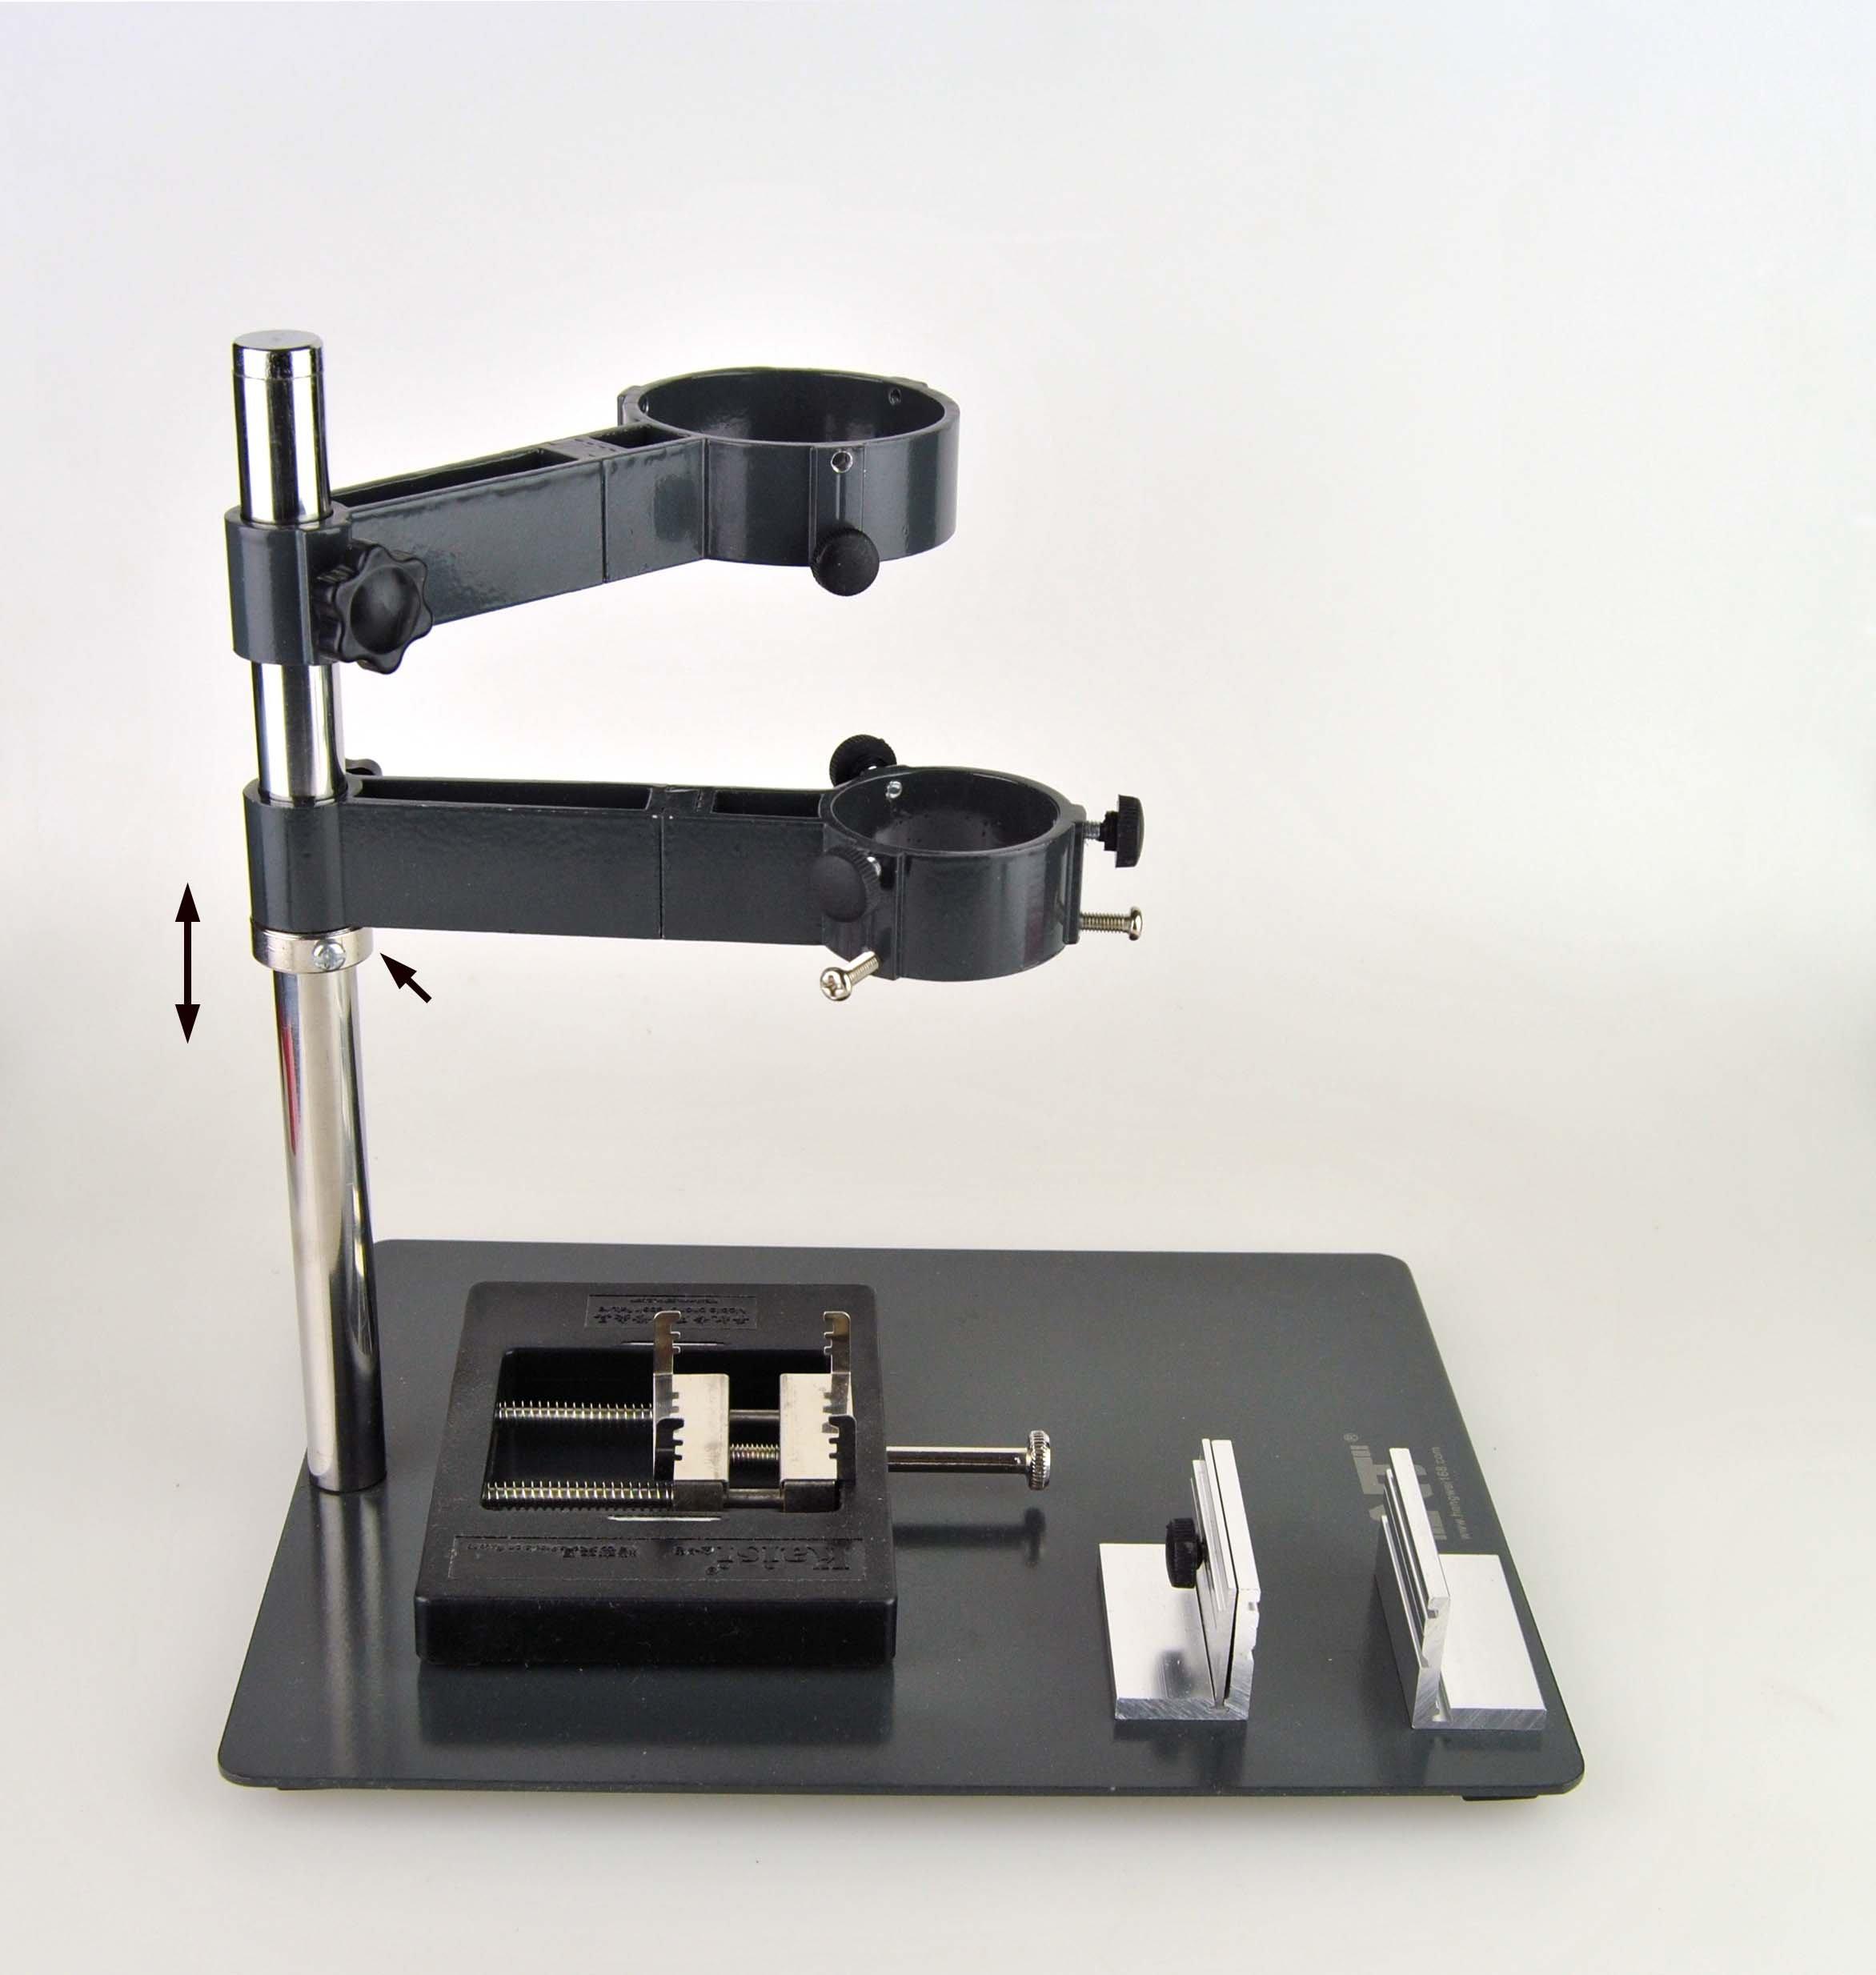 Weber Displays Hot Air Hand-piece Gun Holder with Two Fixtures for SMD Rework Station Soldering Desoldeing De-soldering